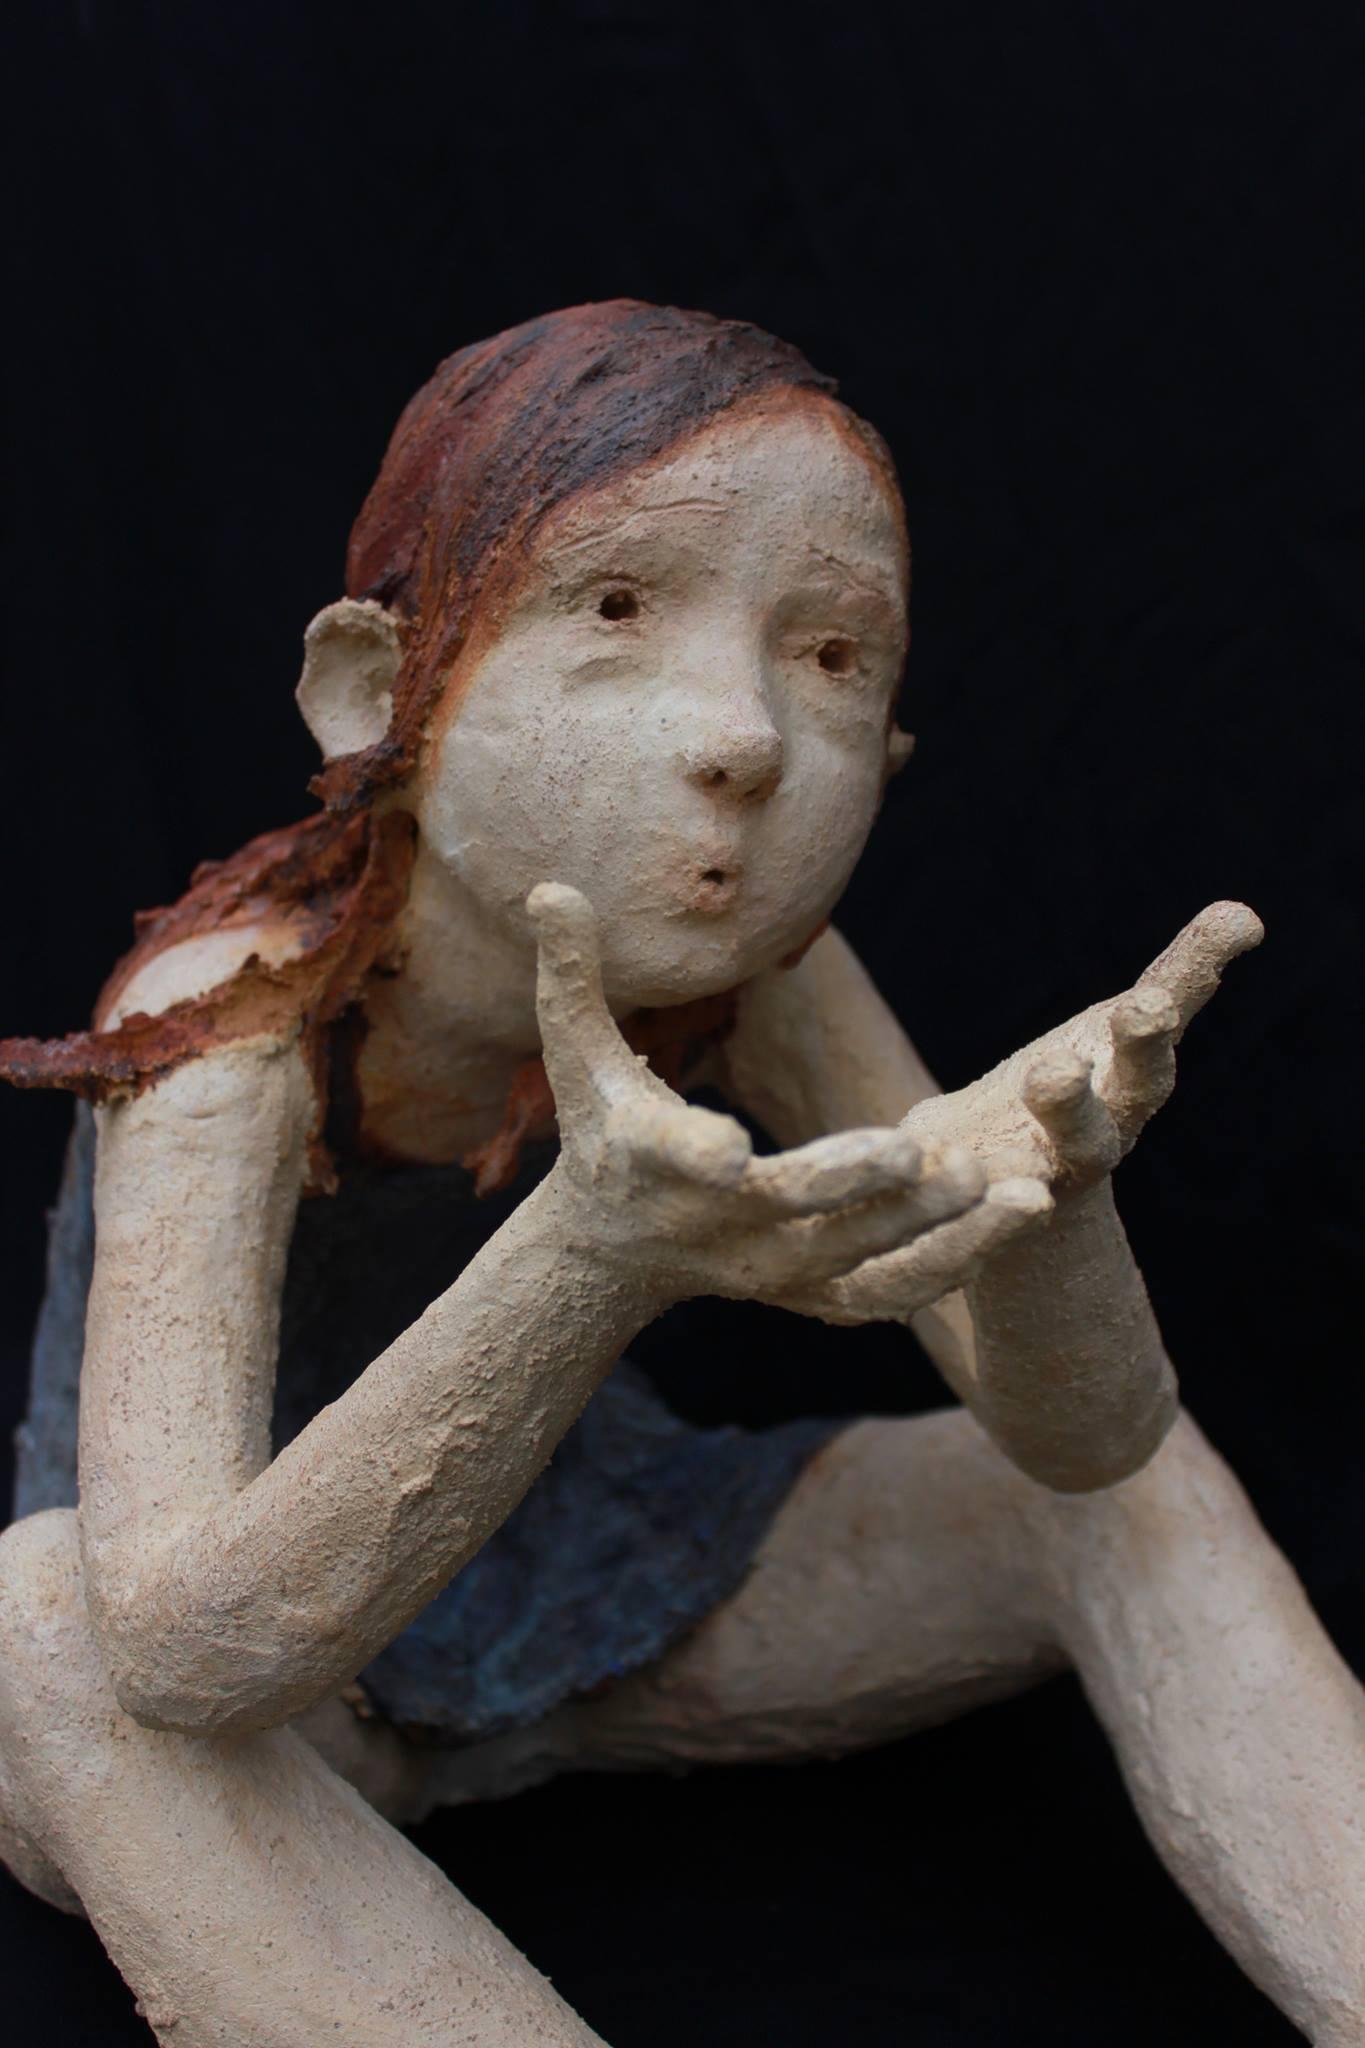 Jurga Sculpteur – A friend of mine has gone today